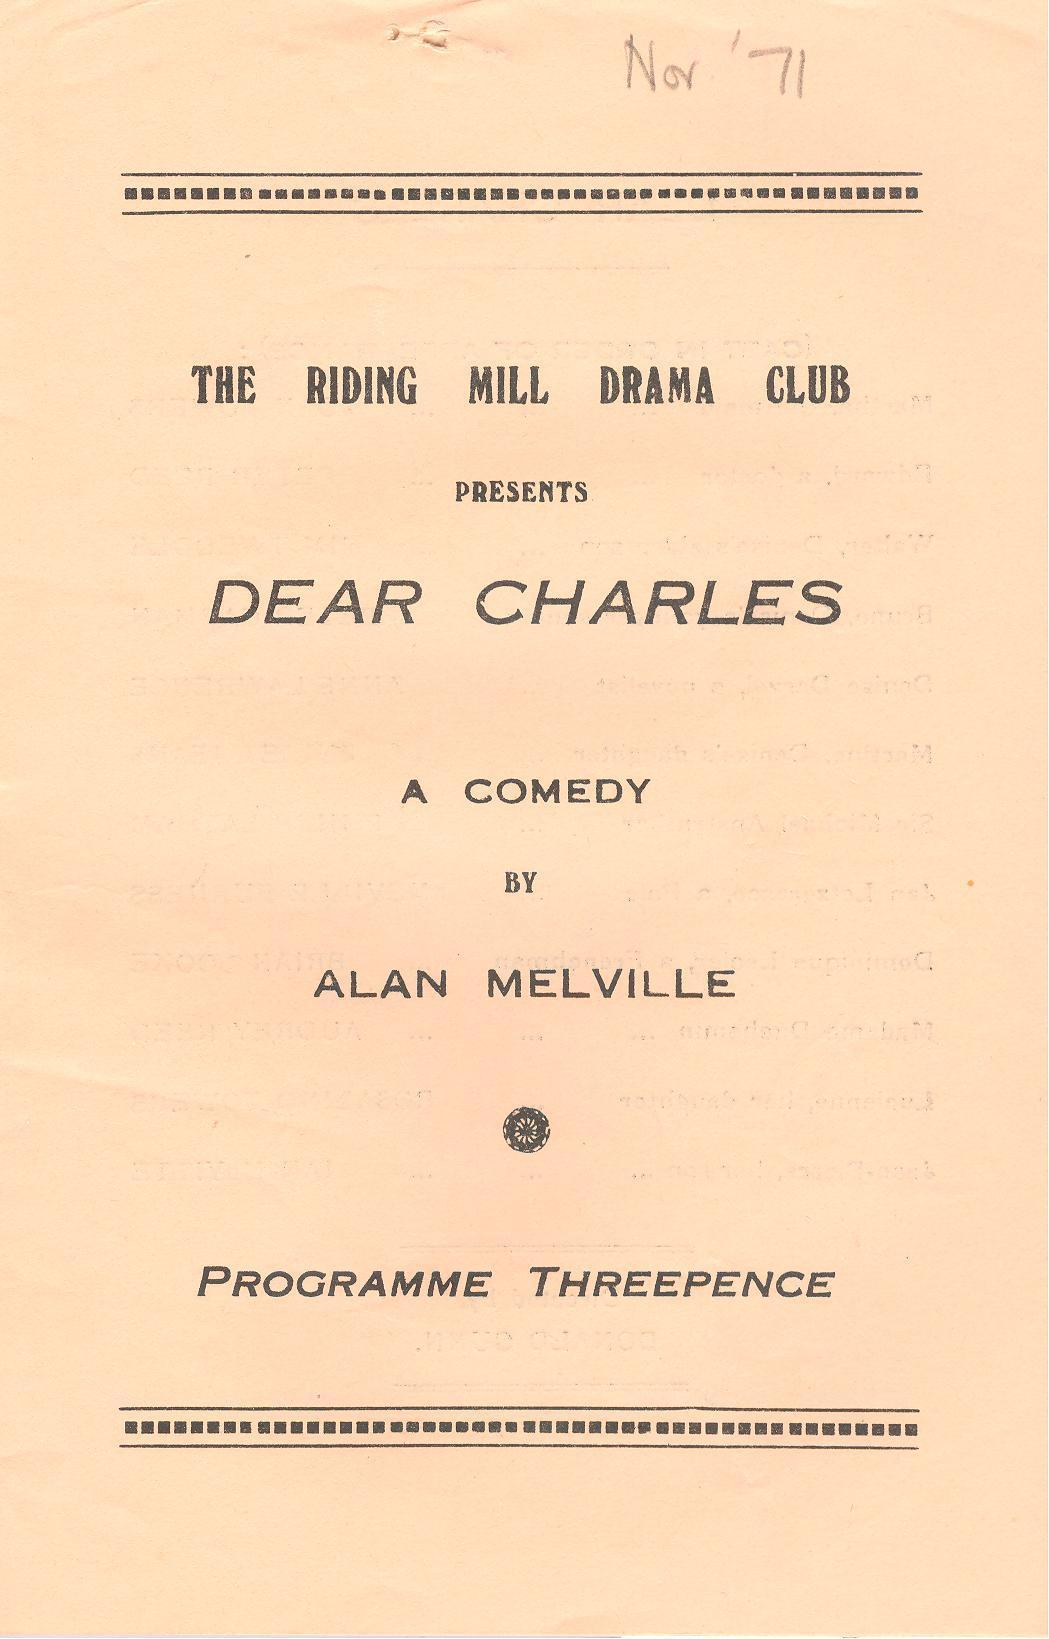 1971, Riding Mill Drama Club, Dear Charl